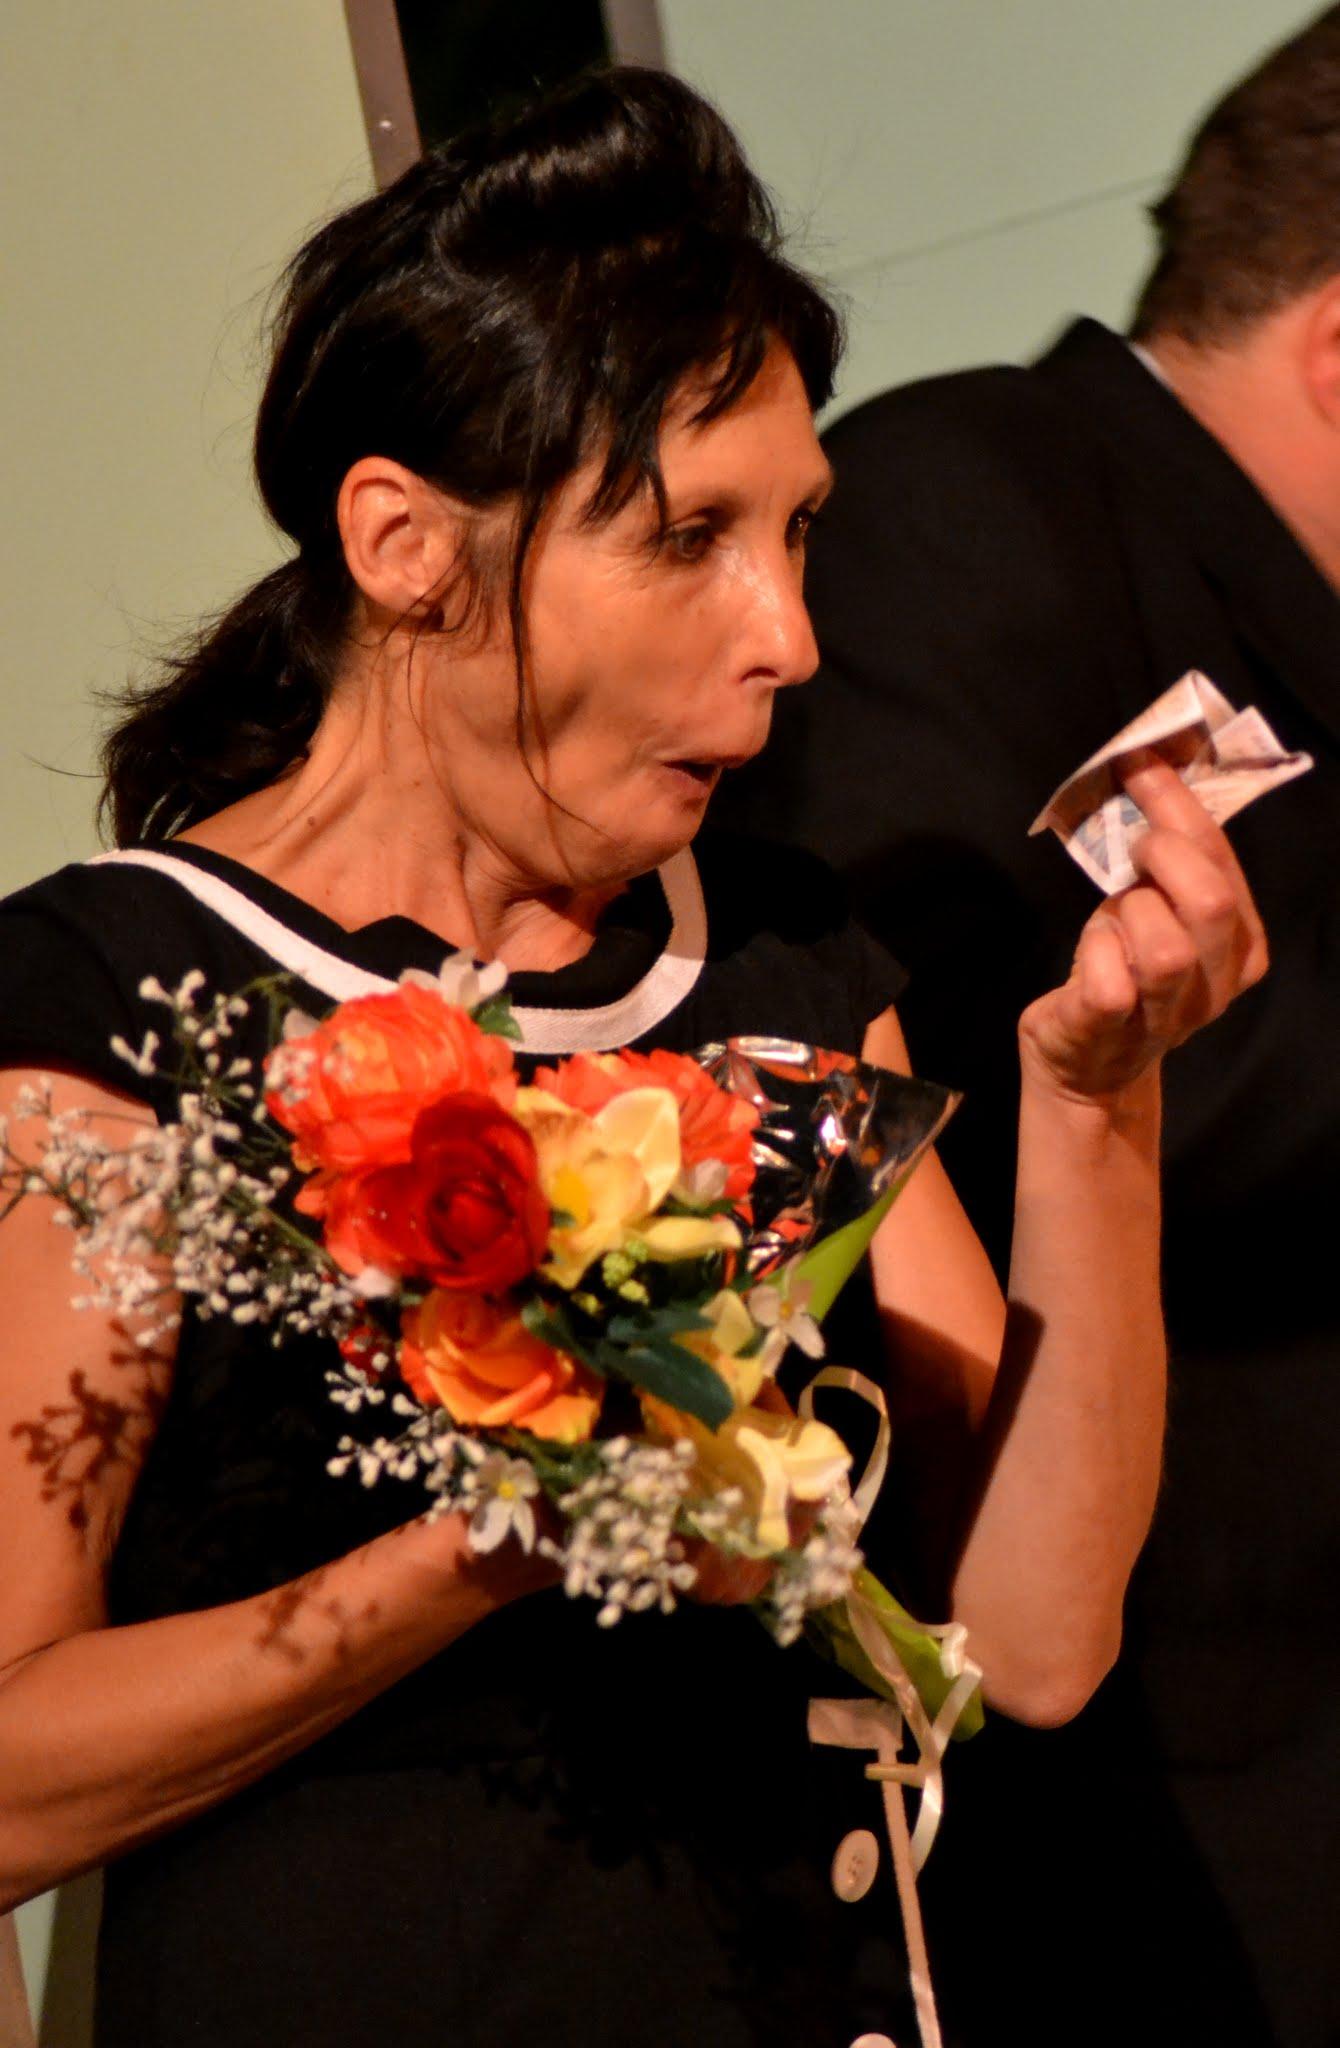 FCVT-2017-Marion tritta-Dame de chez Maxim (186)